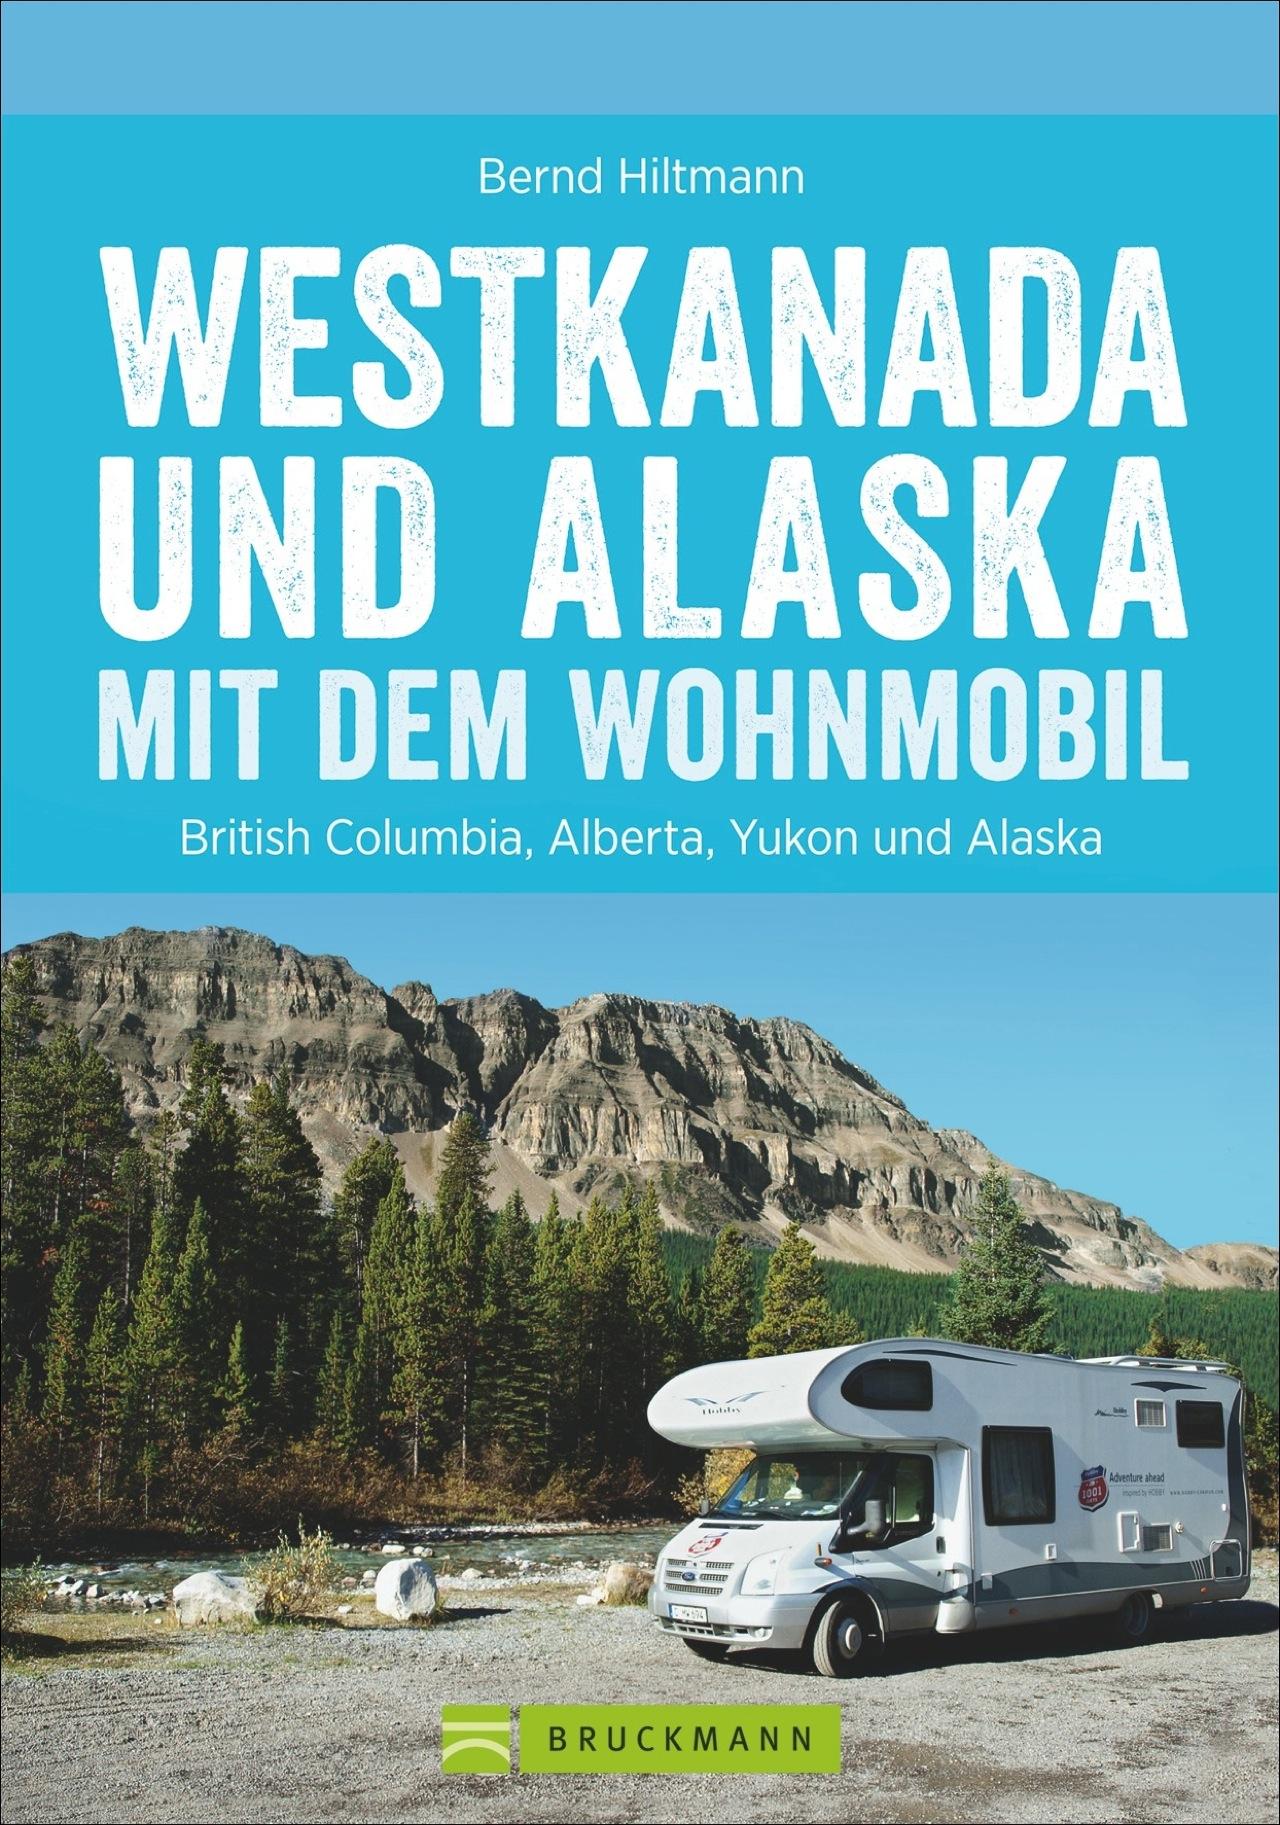 Westkanada-und-Alaska-mit-dem-Wohnmobil-Bernd-Hiltmann